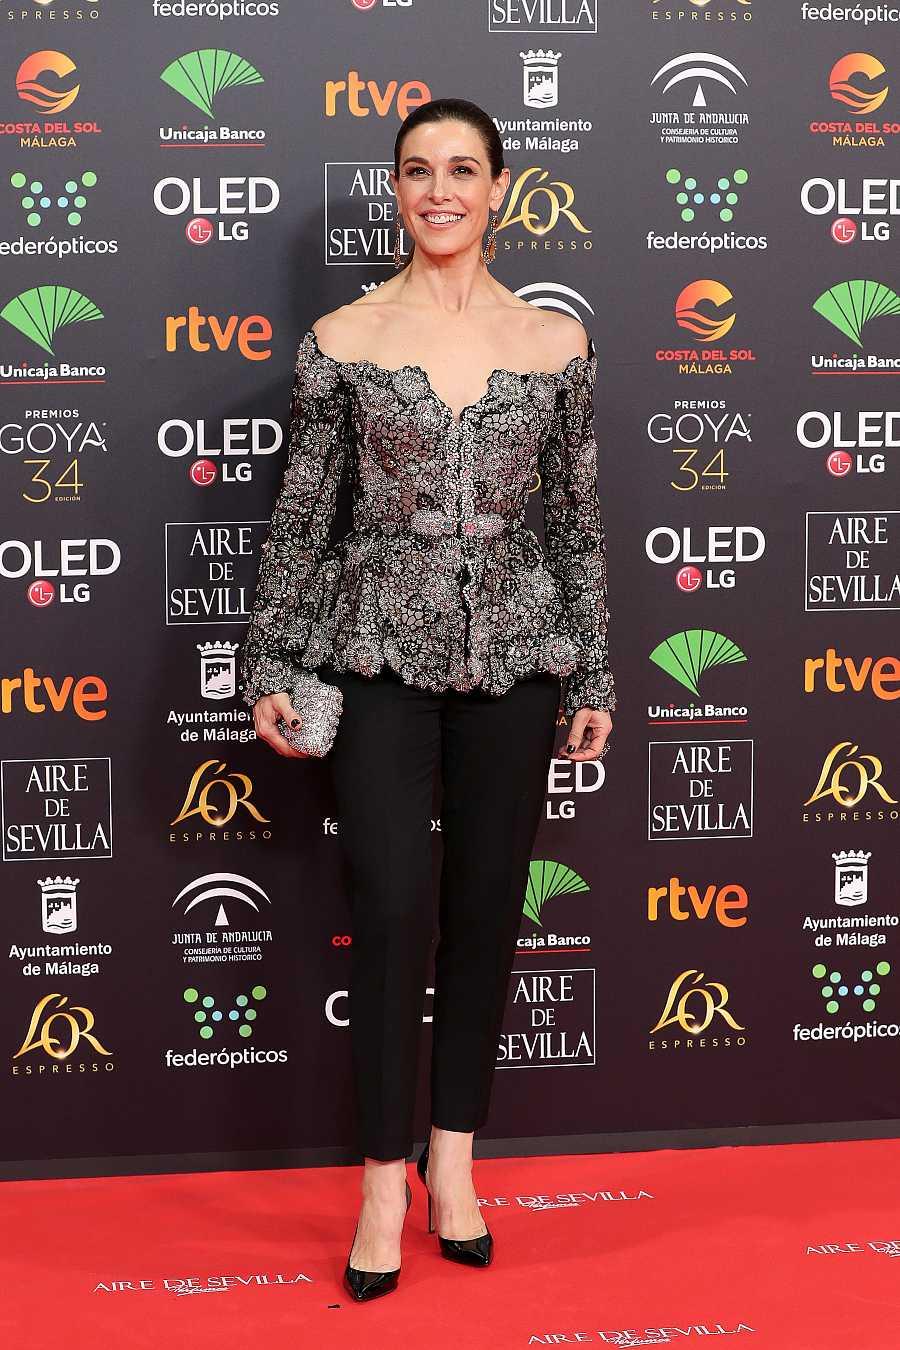 Presenter Raquel Sanchez Silva at photocall of the 34th annual Goya Film Awards in Malaga on Saturday, 25 January 2020.